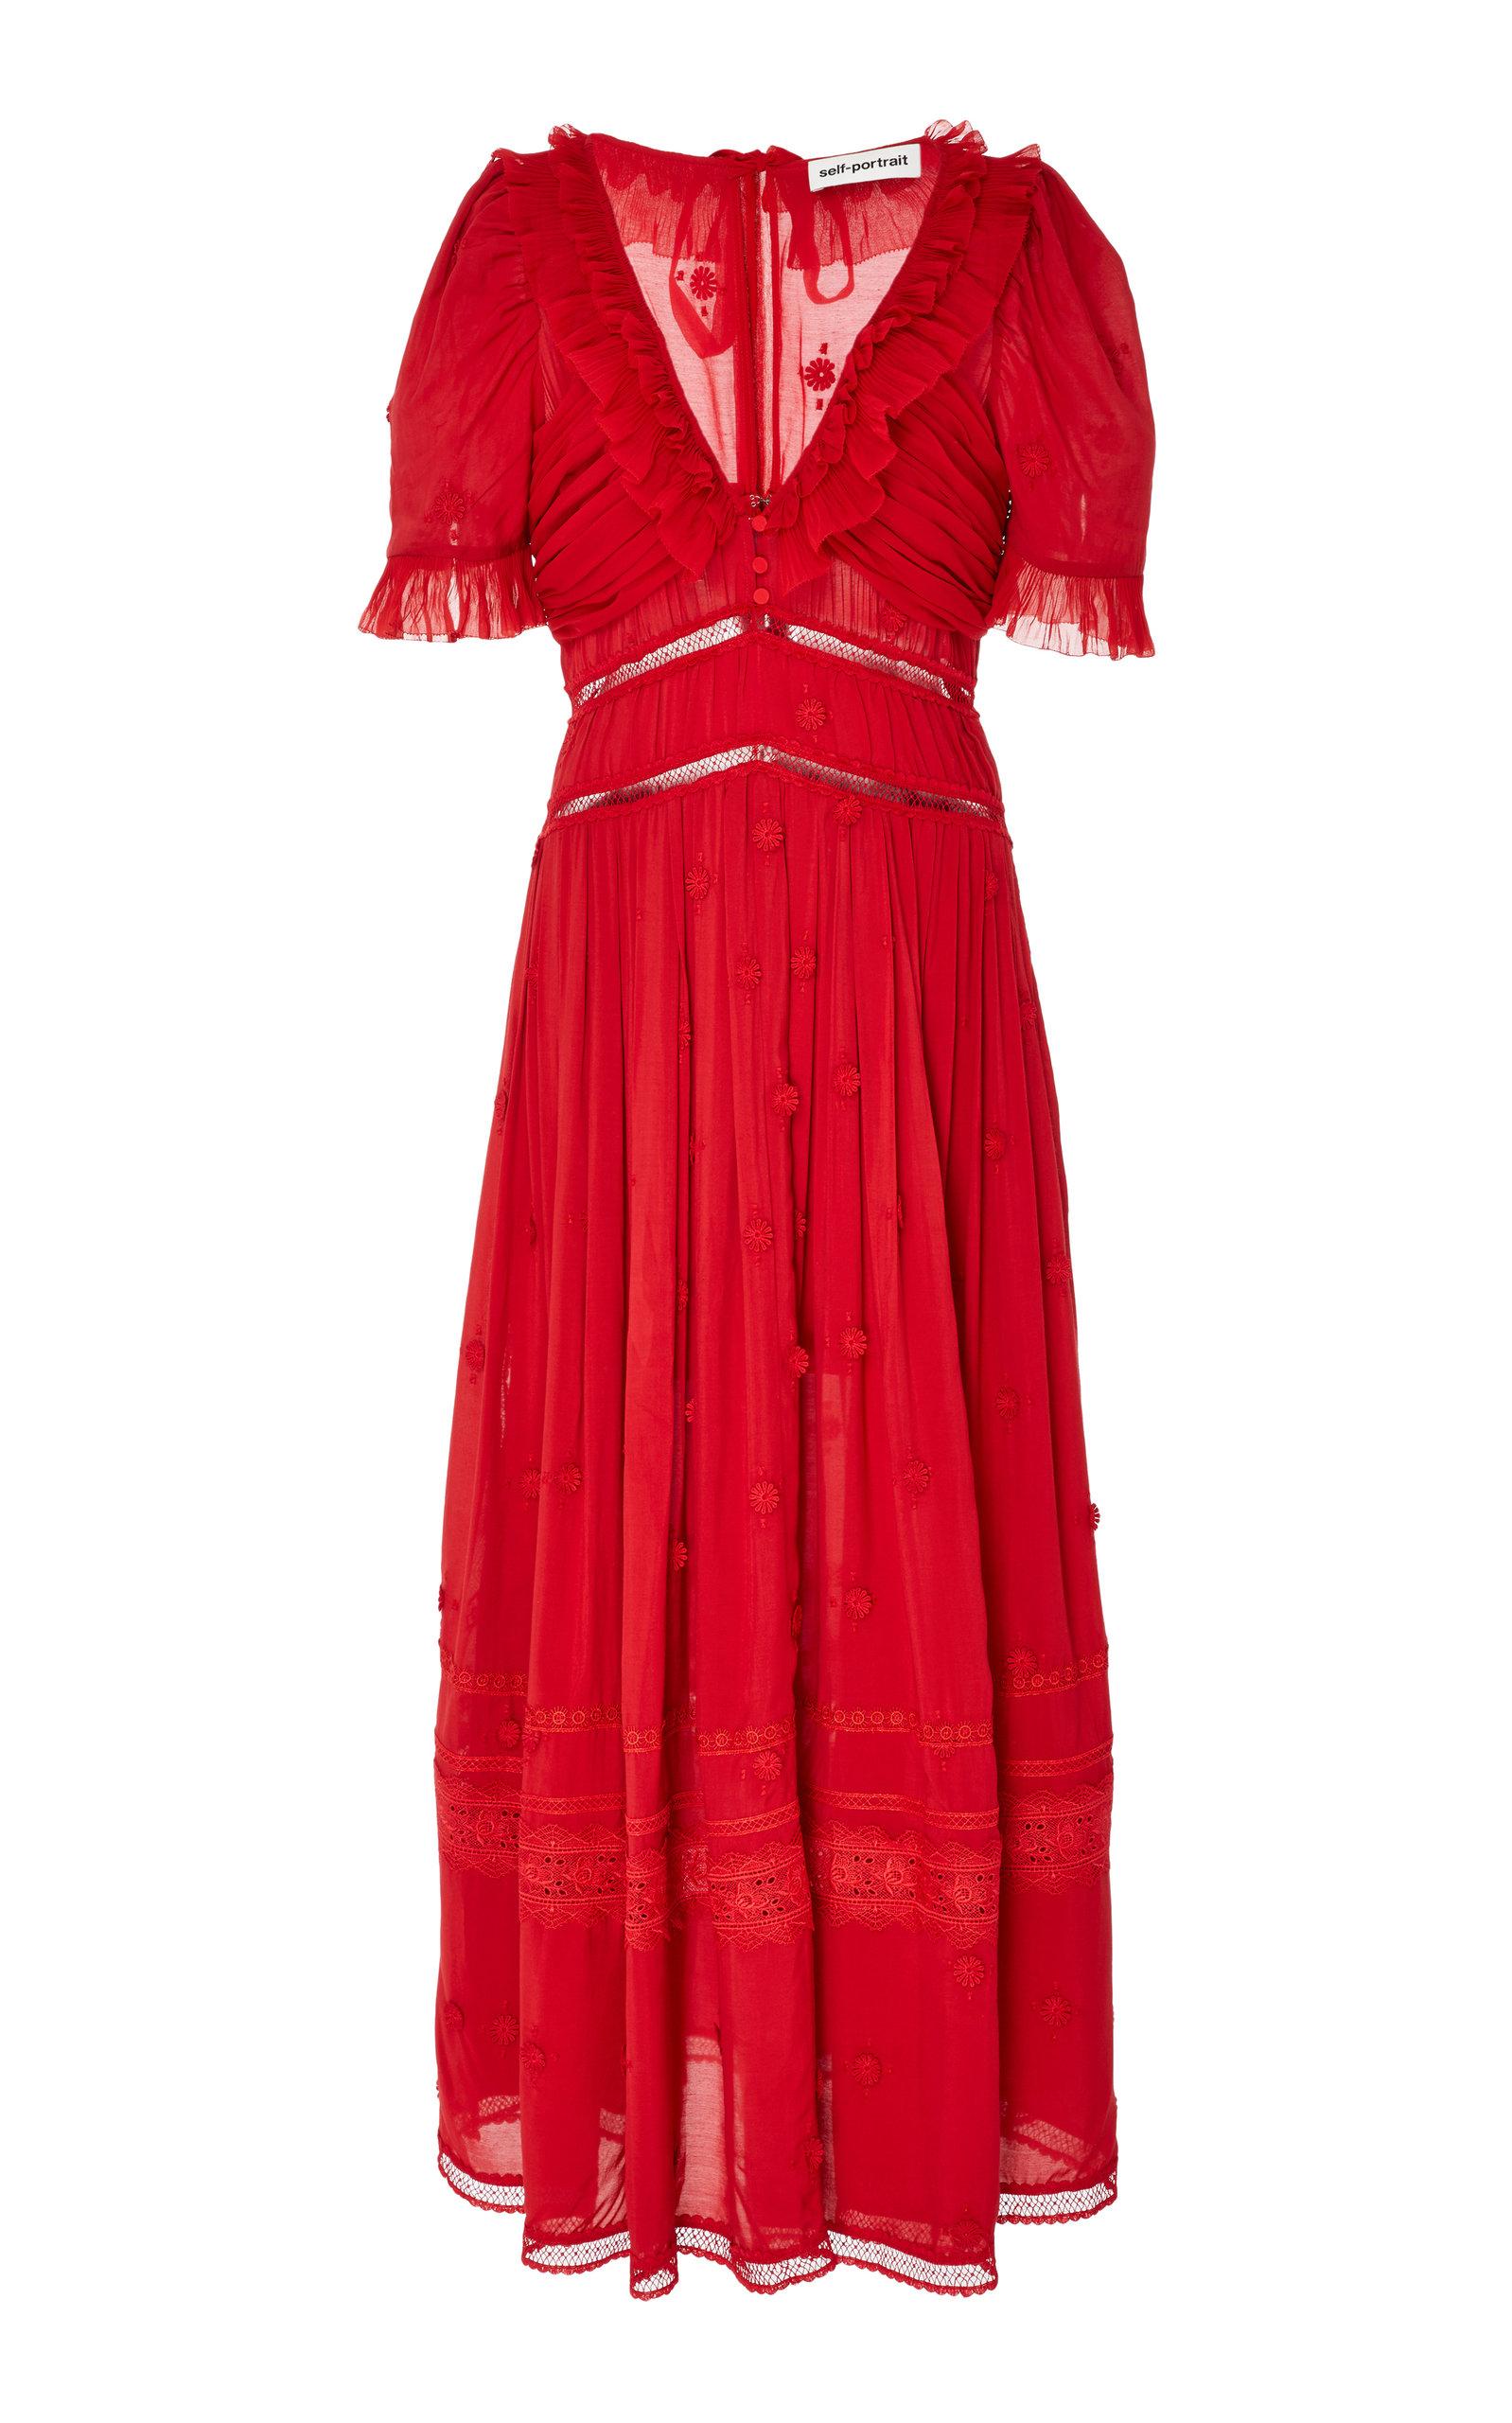 33d1df6ceaa Self PortraitPlumetis Lace-Detailed Chiffon Midi Dress. CLOSE. Loading